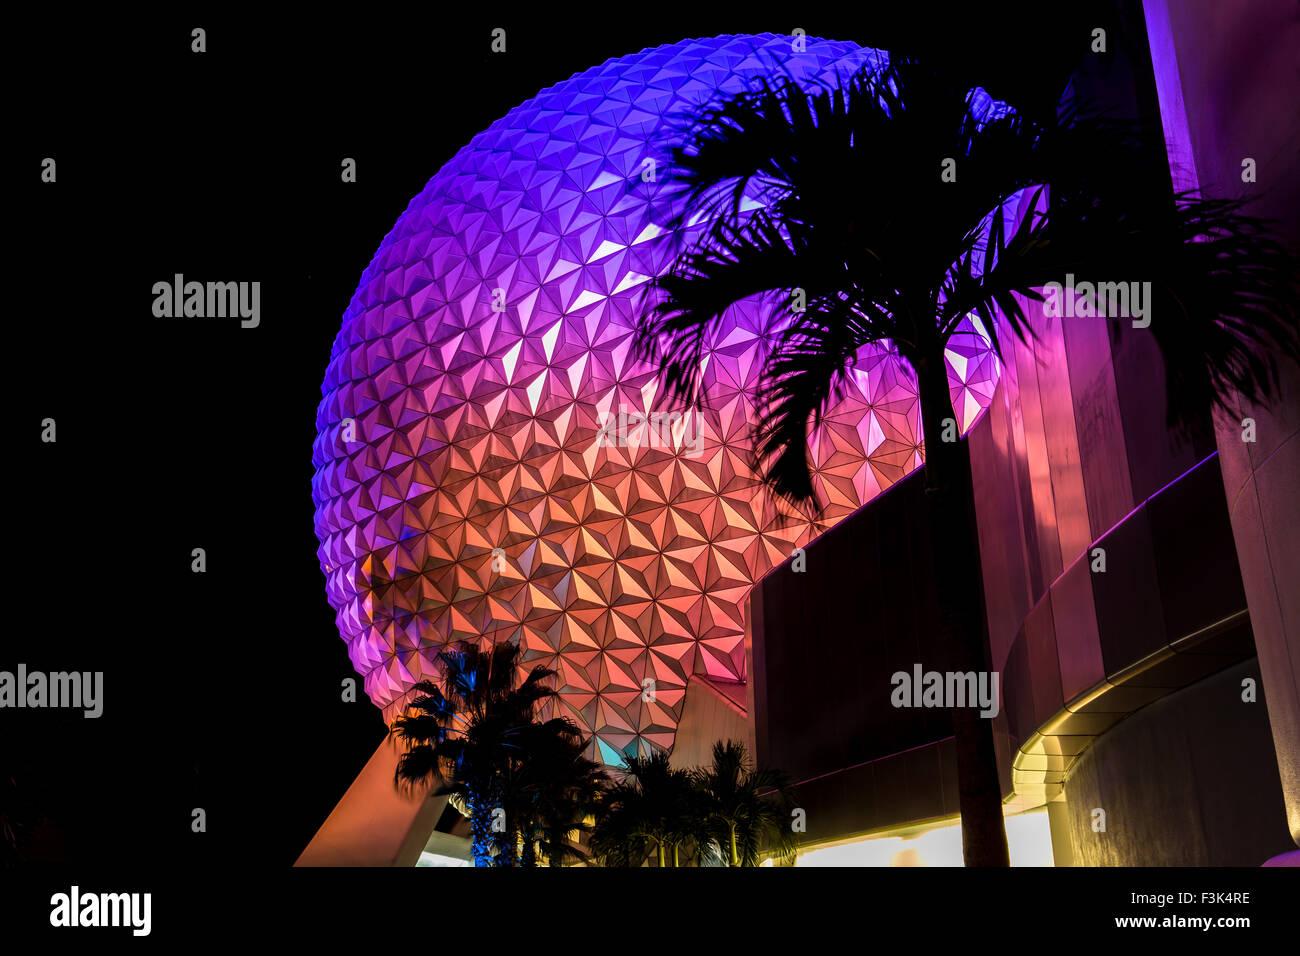 Spaceship Earth at Epcot theme park, Florida - Stock Image